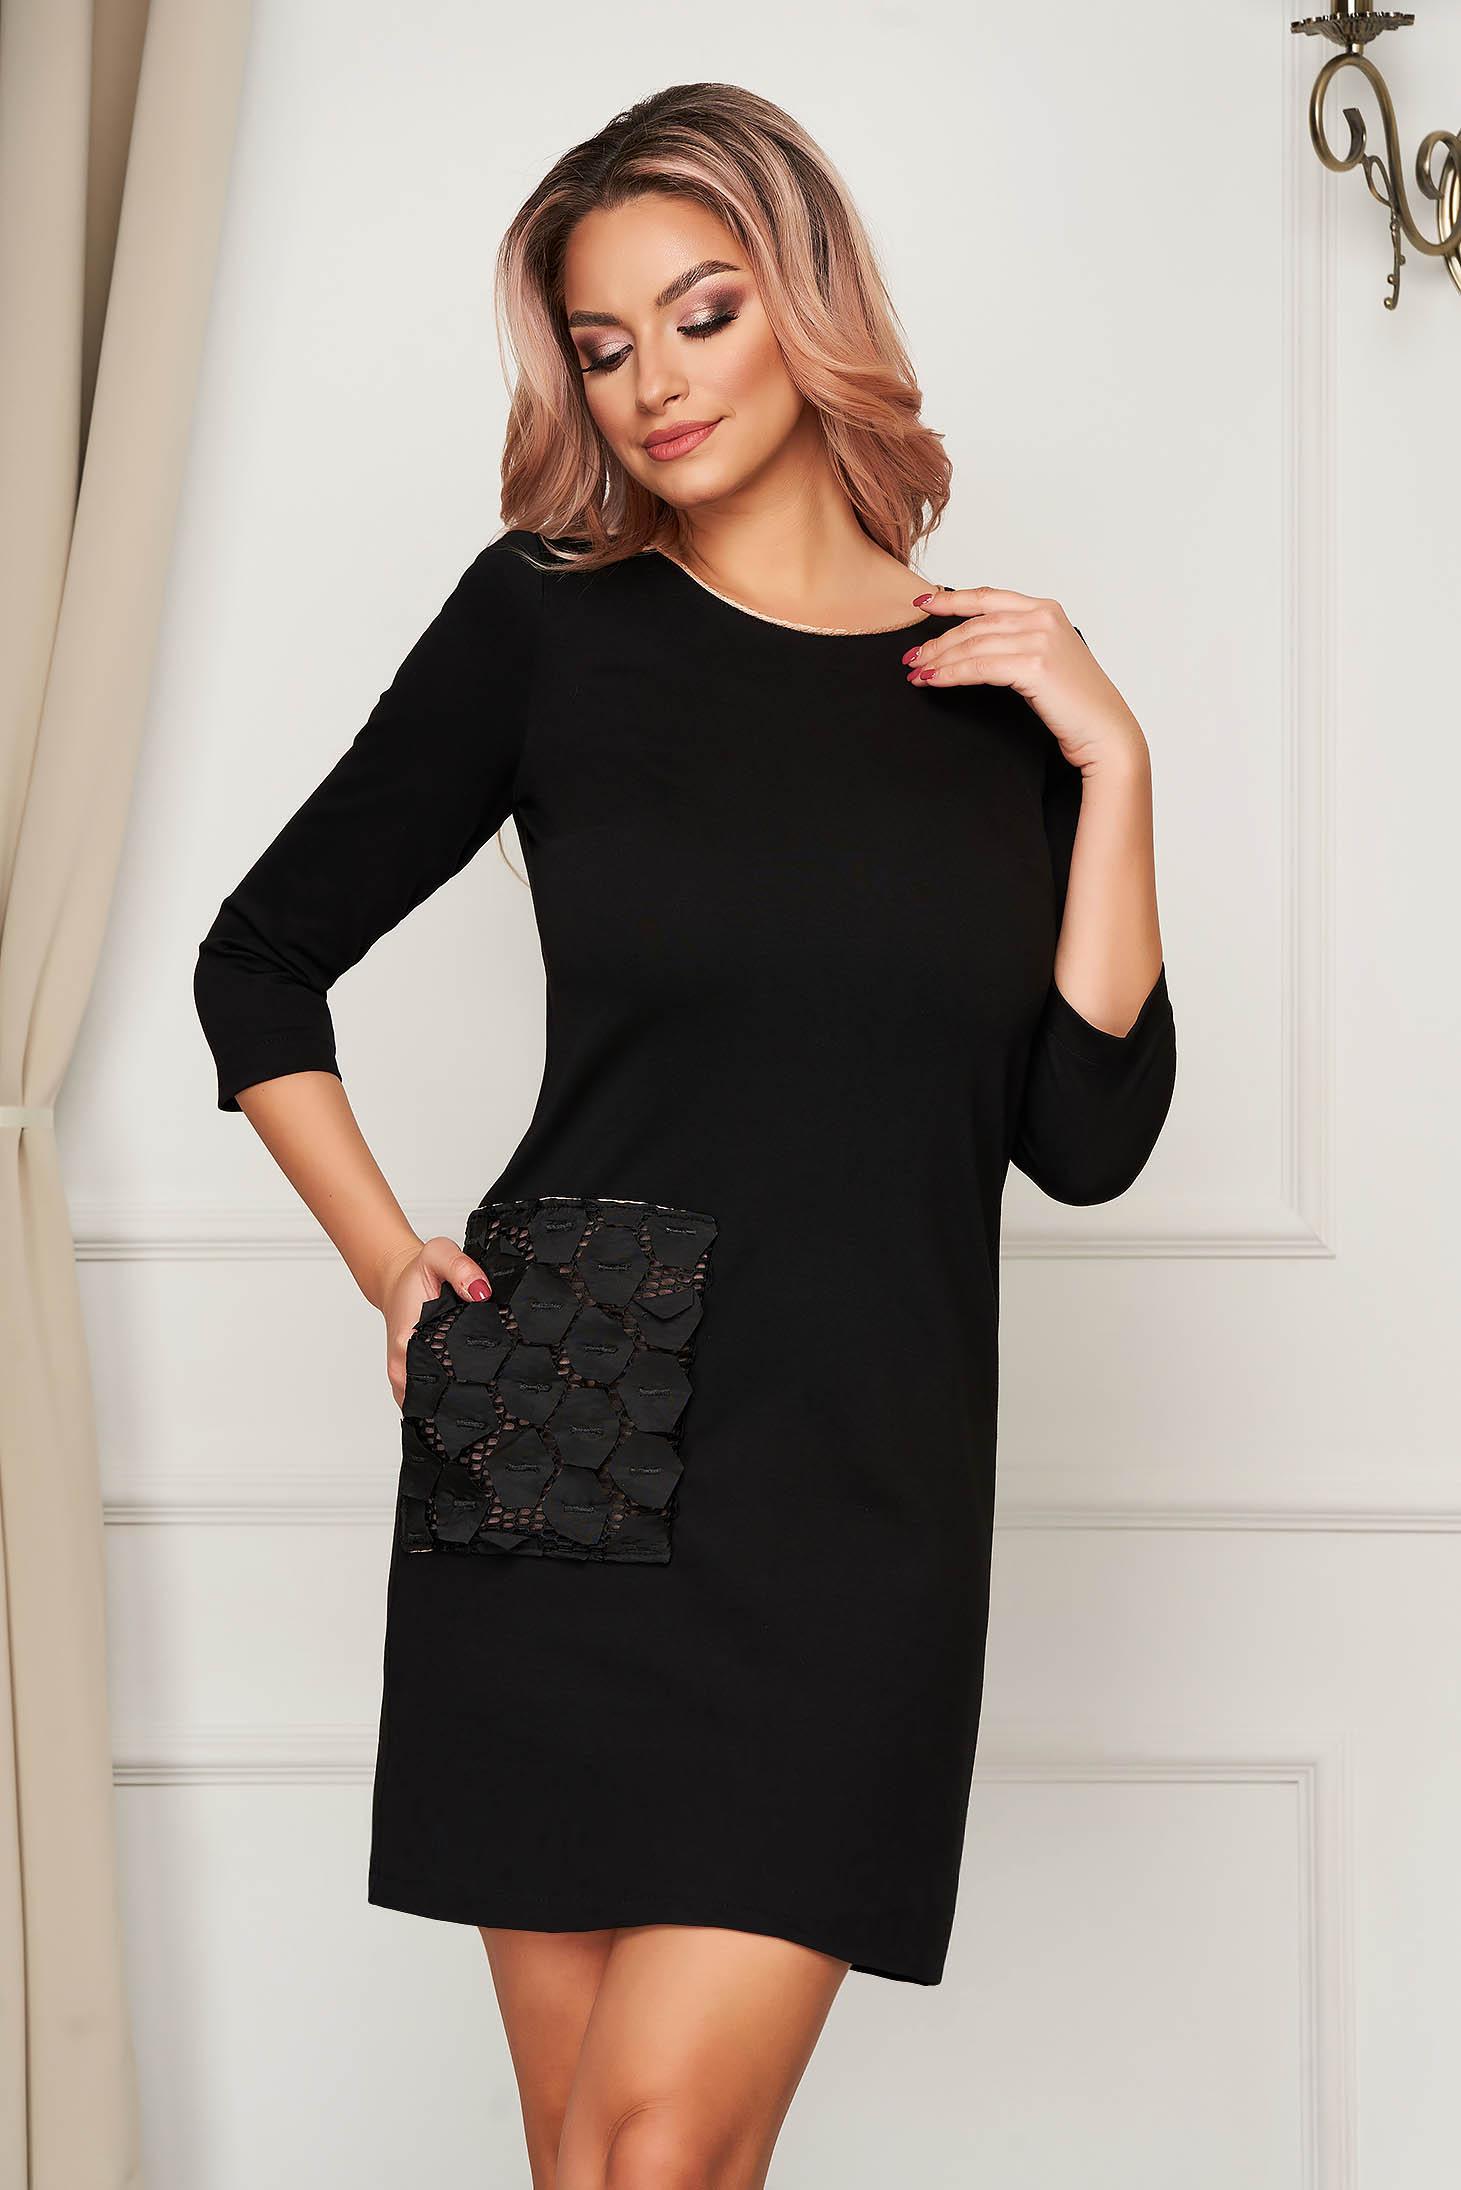 Daily midi black dress StarShinerS flared jersey with pockets net stockings